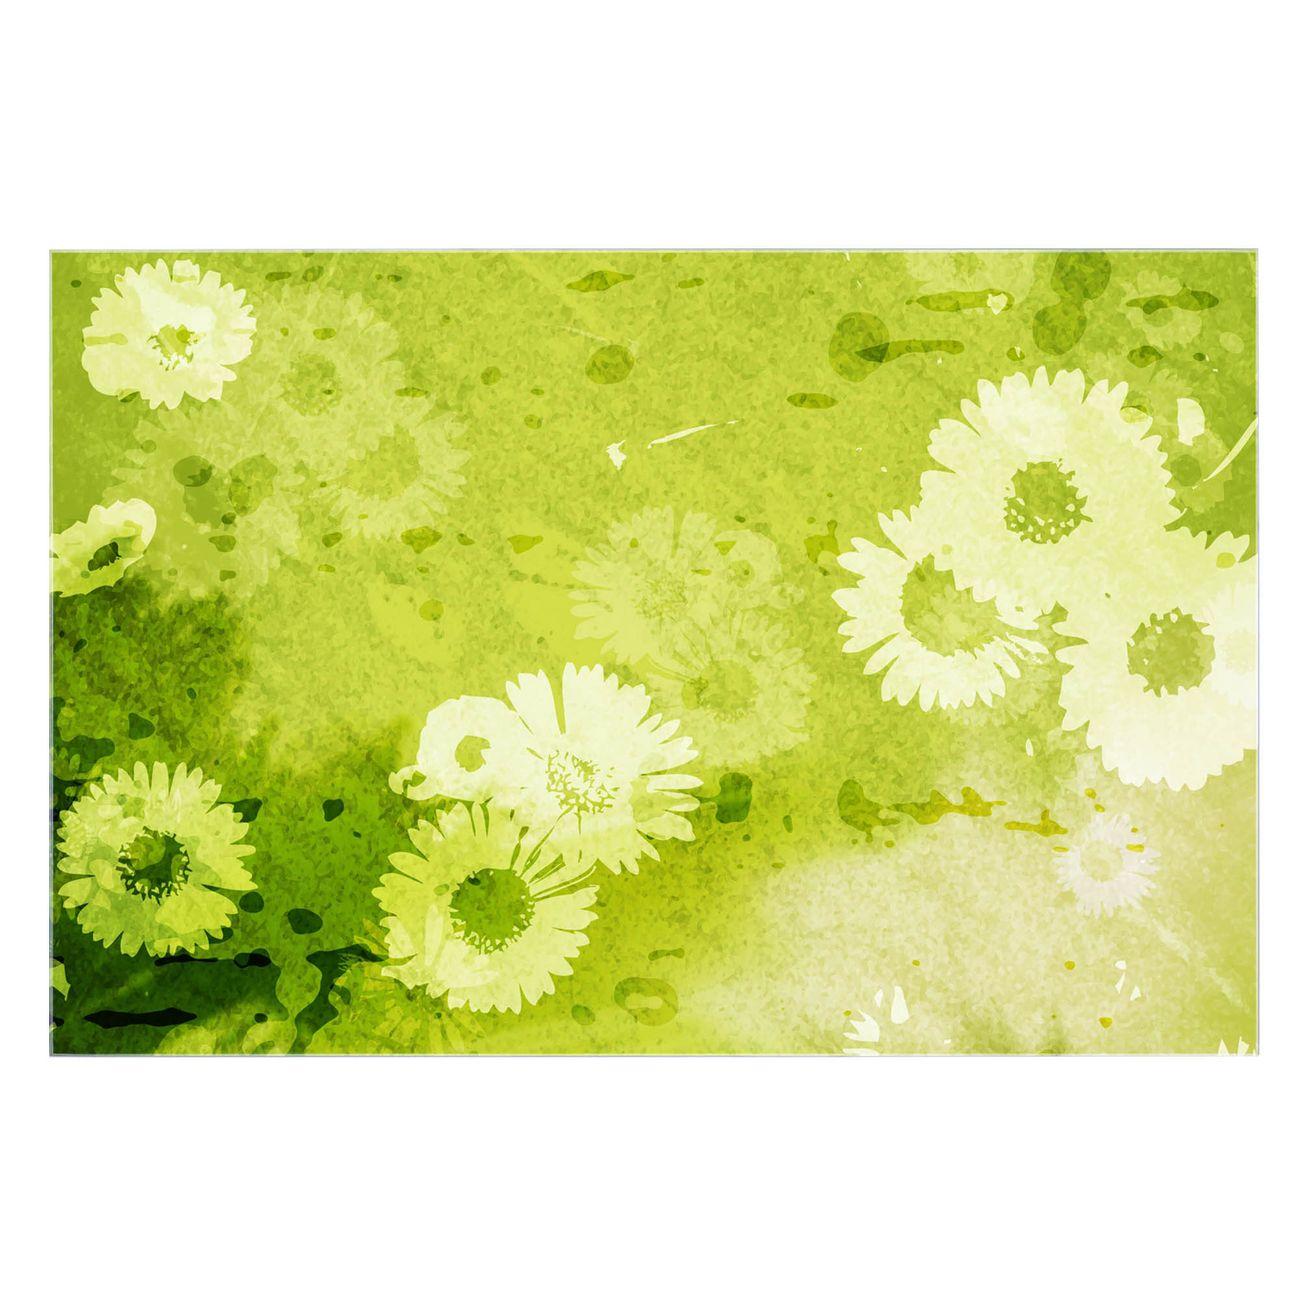 Küchenrückwand Glas Motiv Kamille Grün